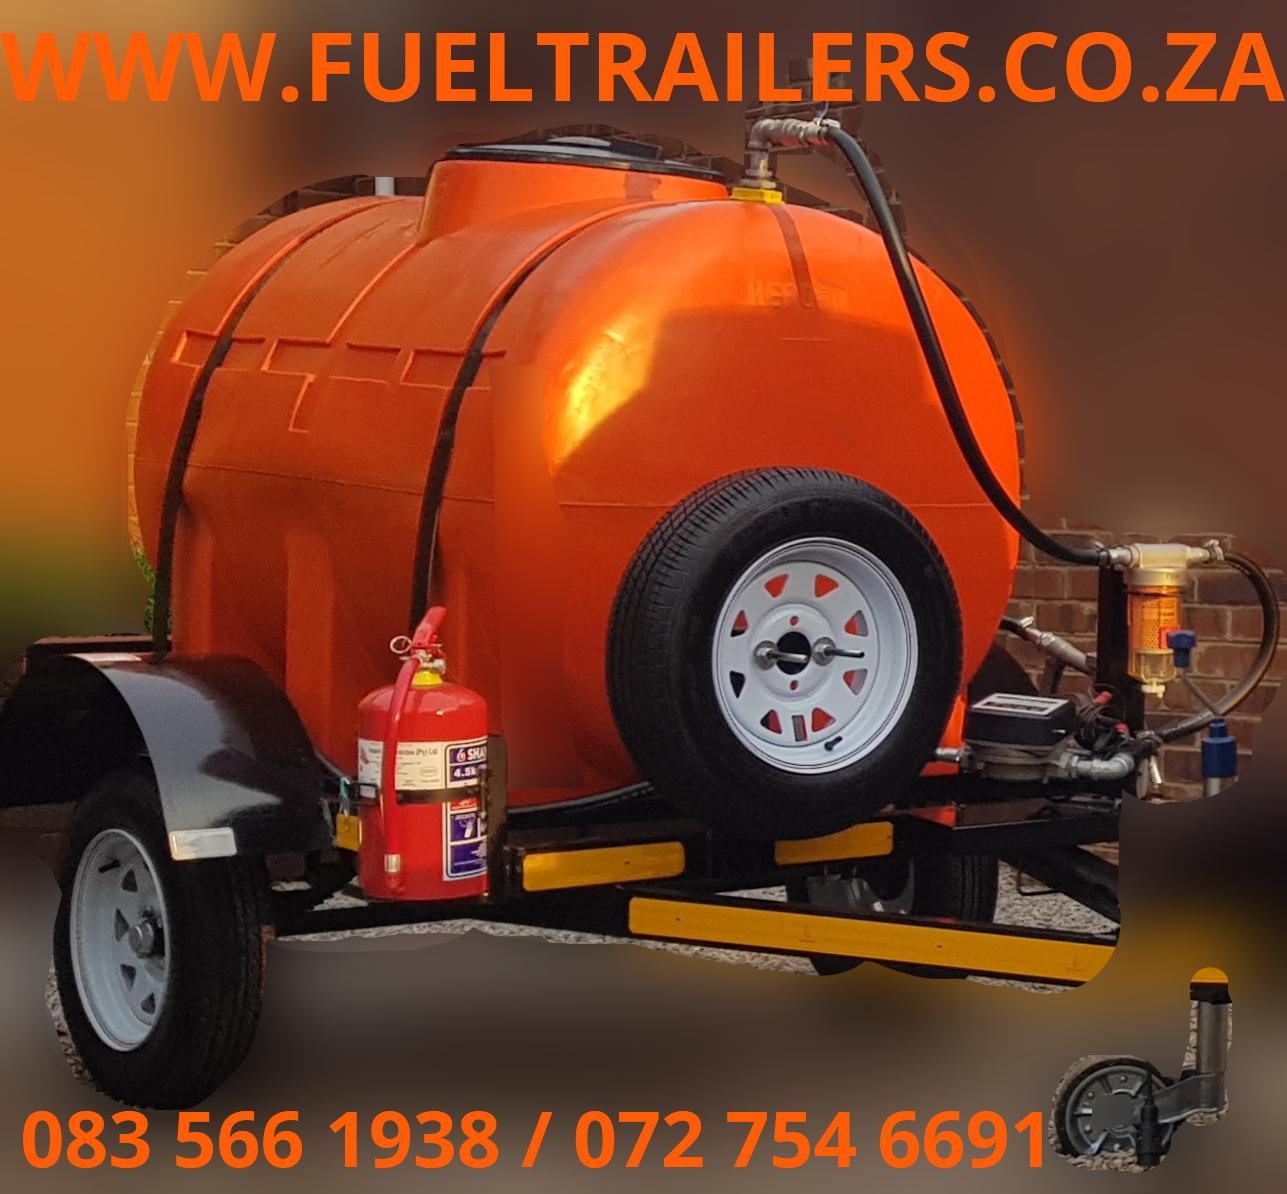 1000 liter MILD STEEL , STAINLESS STEEL OR PLASTIC BOWSER